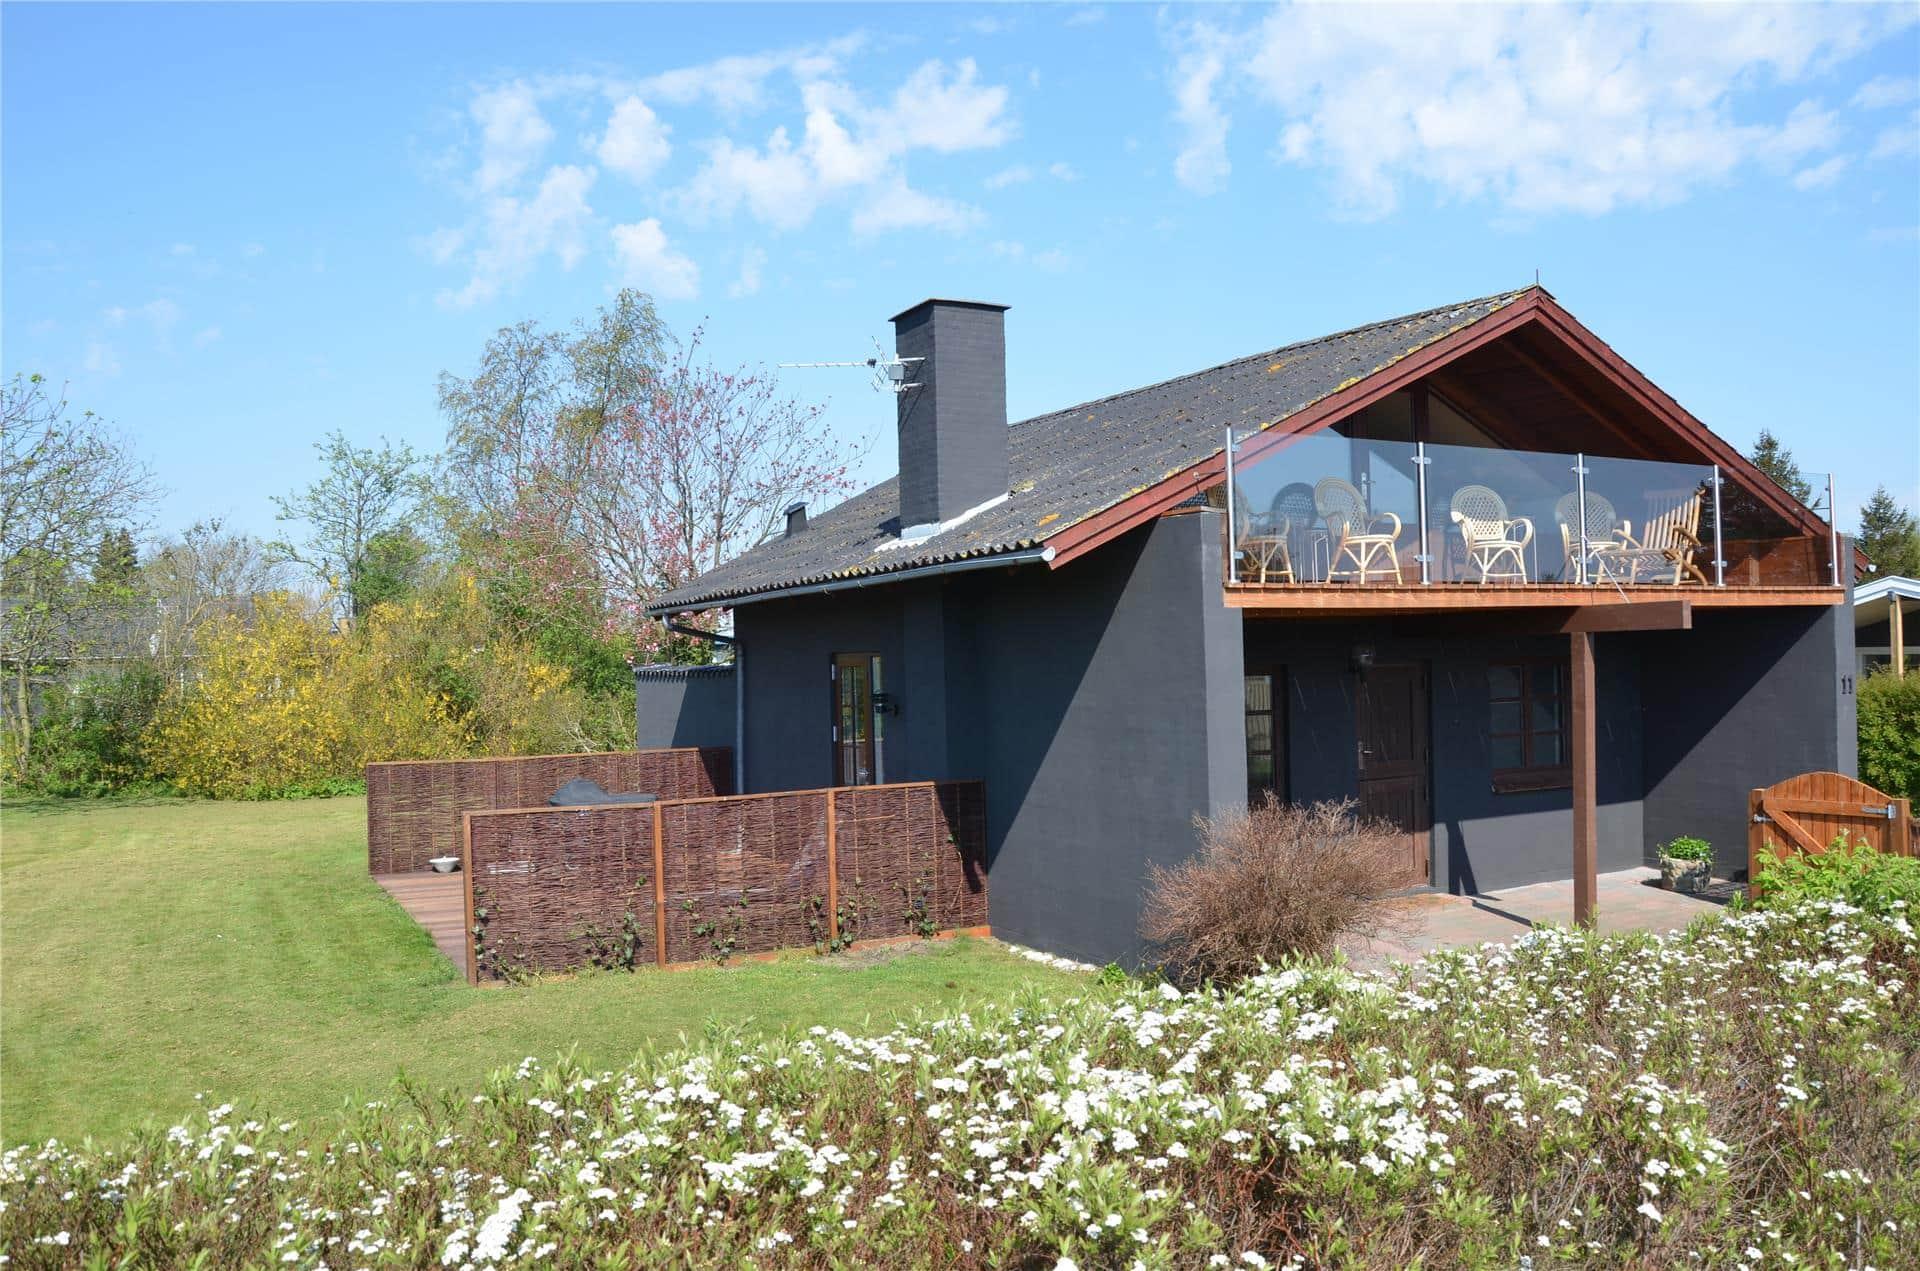 Billede 1-3 Sommerhus M66223, Stubmarken 11, DK - 5874 Hesselager